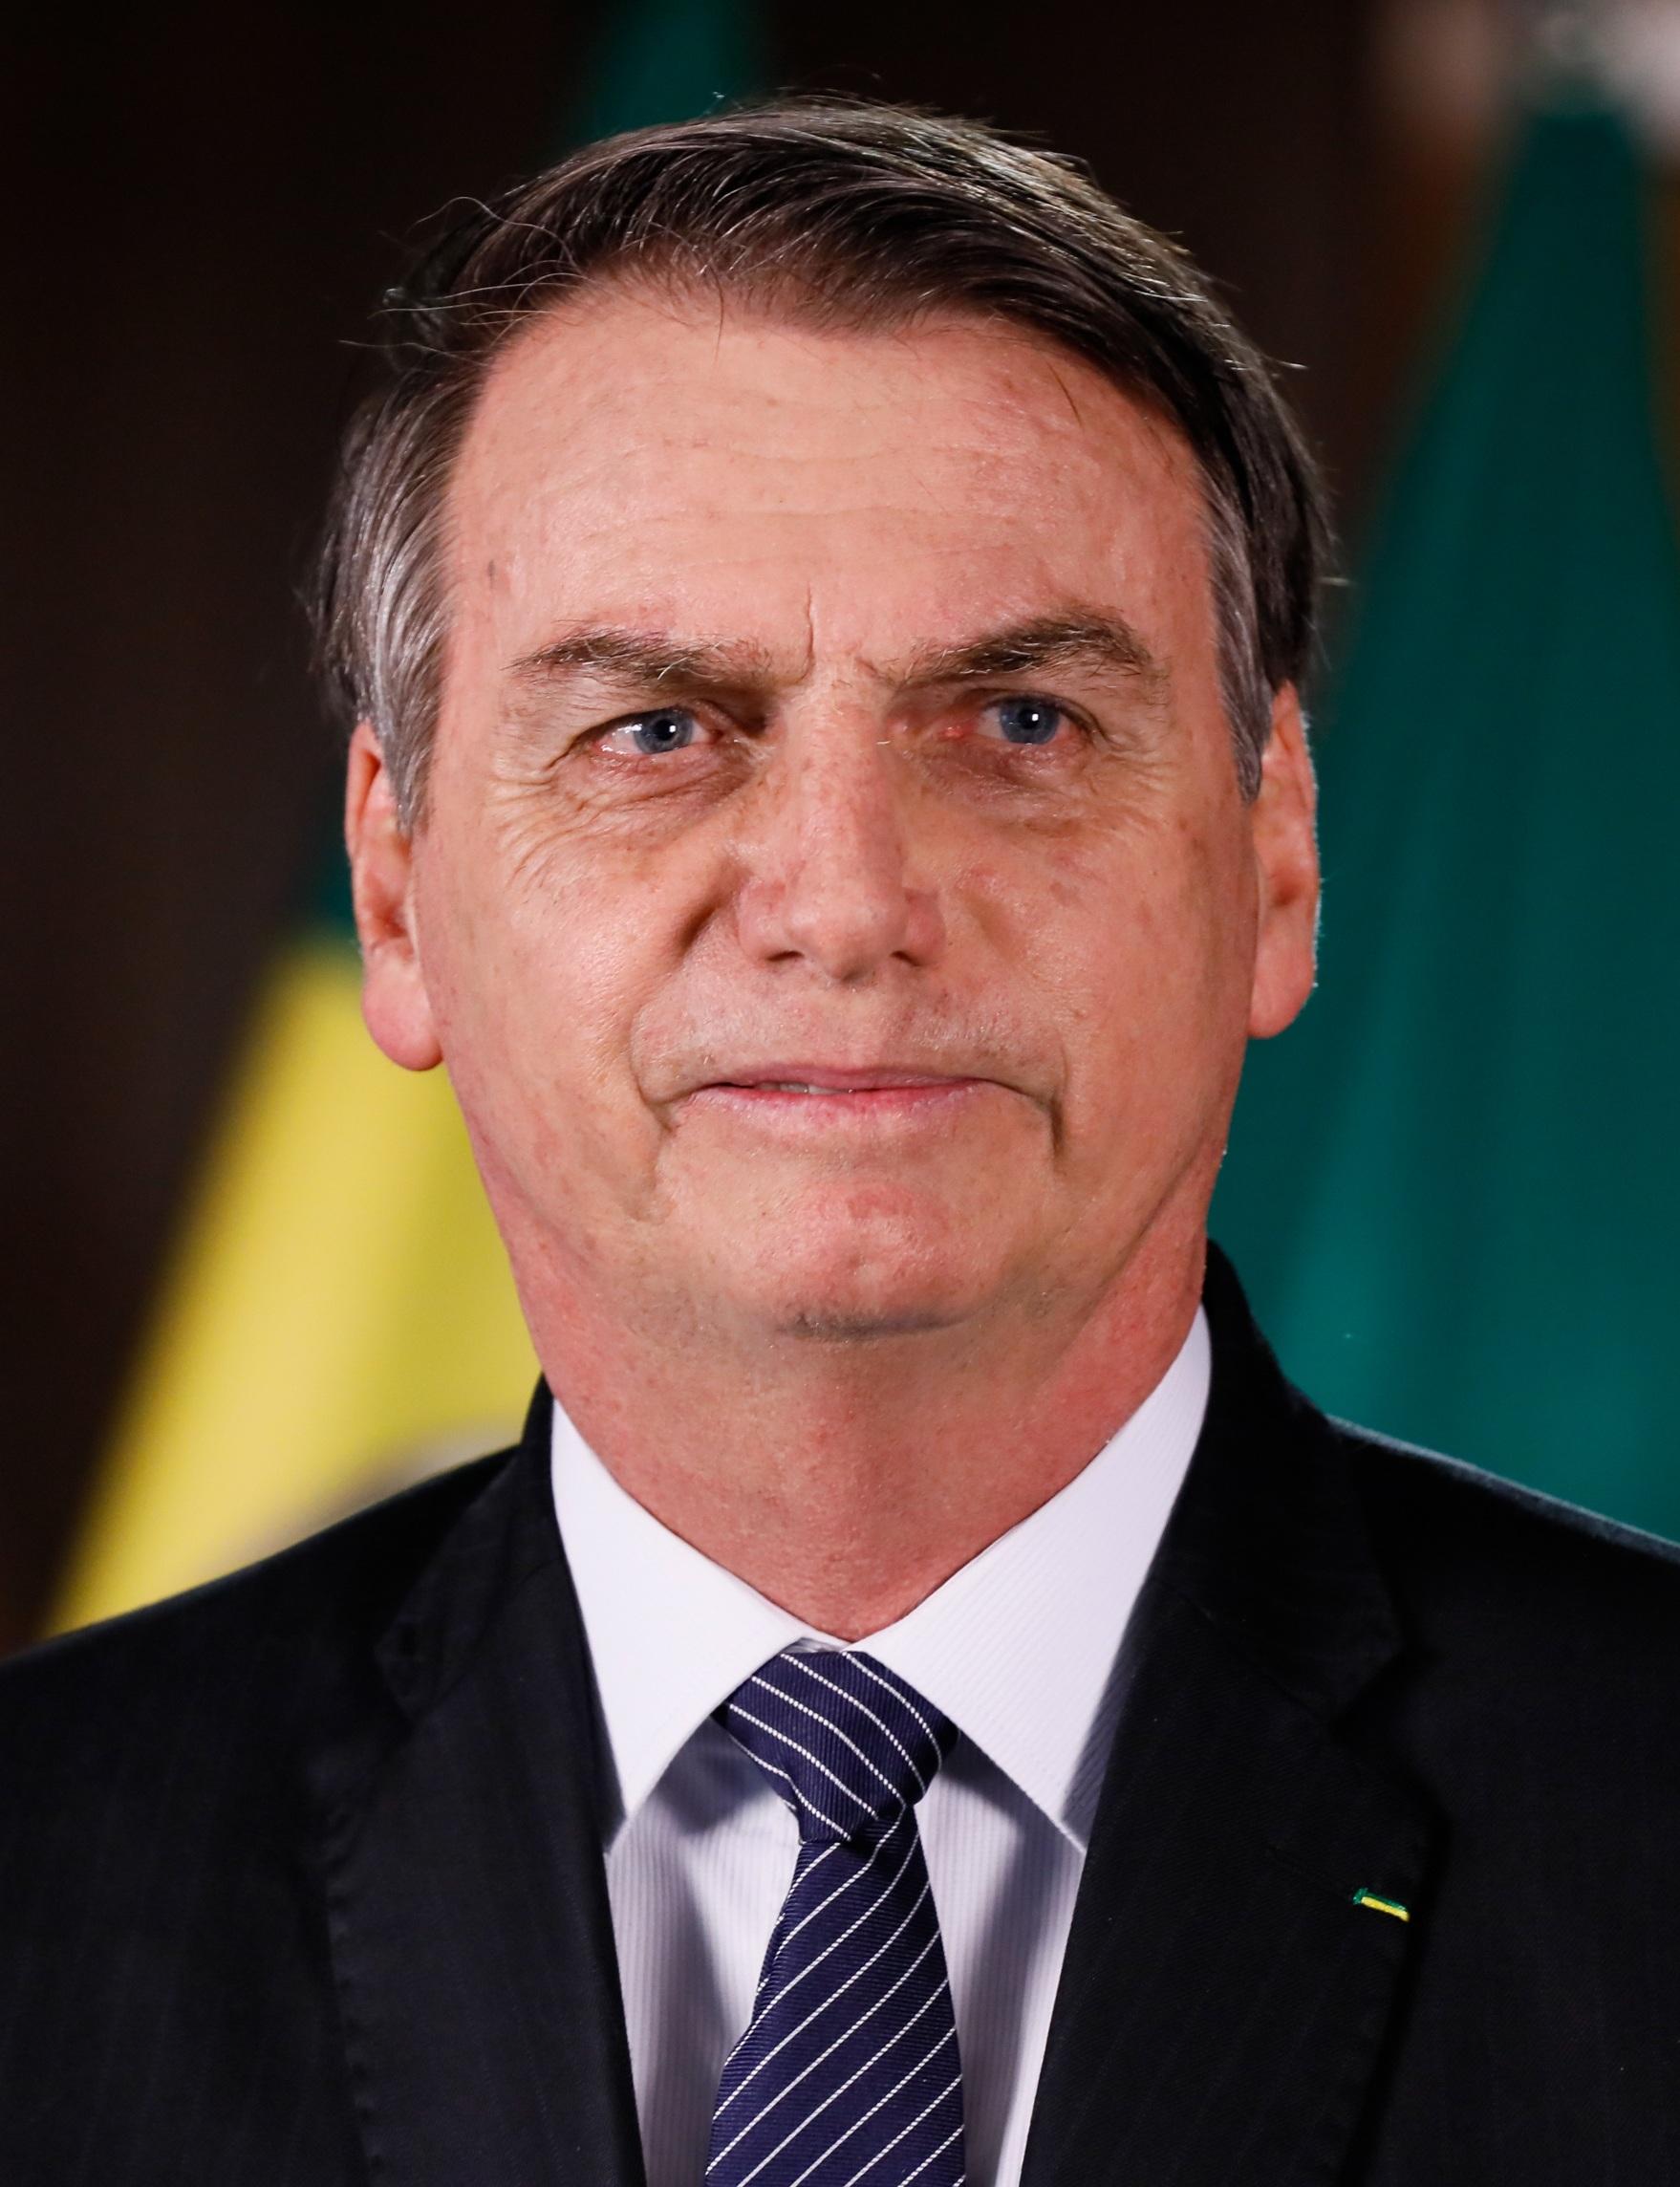 Jair Bolsonaro Wikipedia La Enciclopedia Libre